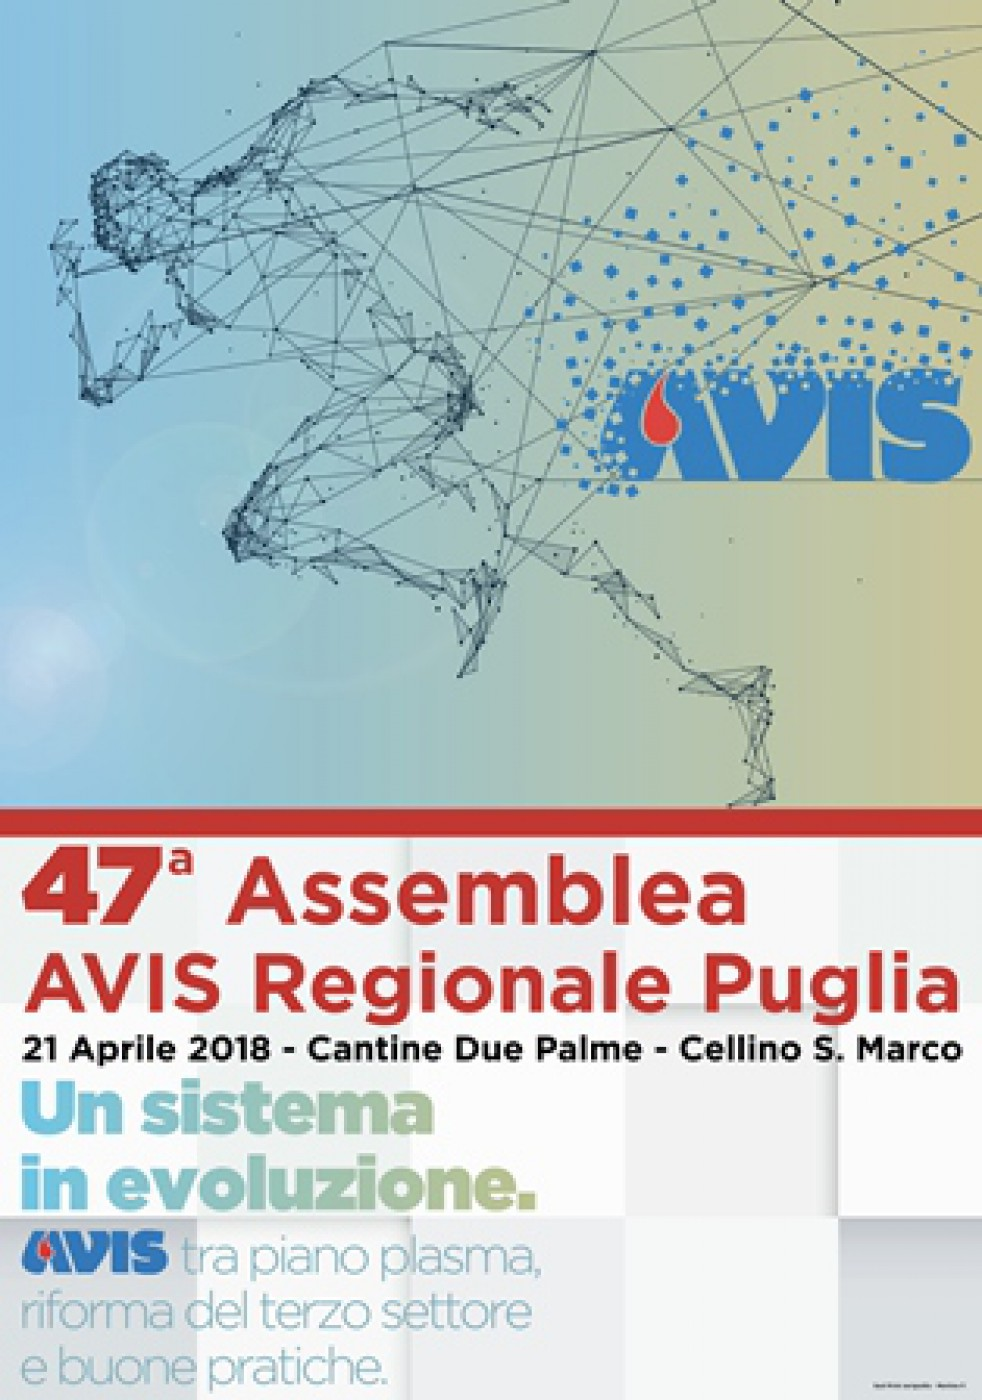 47^ Assemblea Avis Regionale Puglia